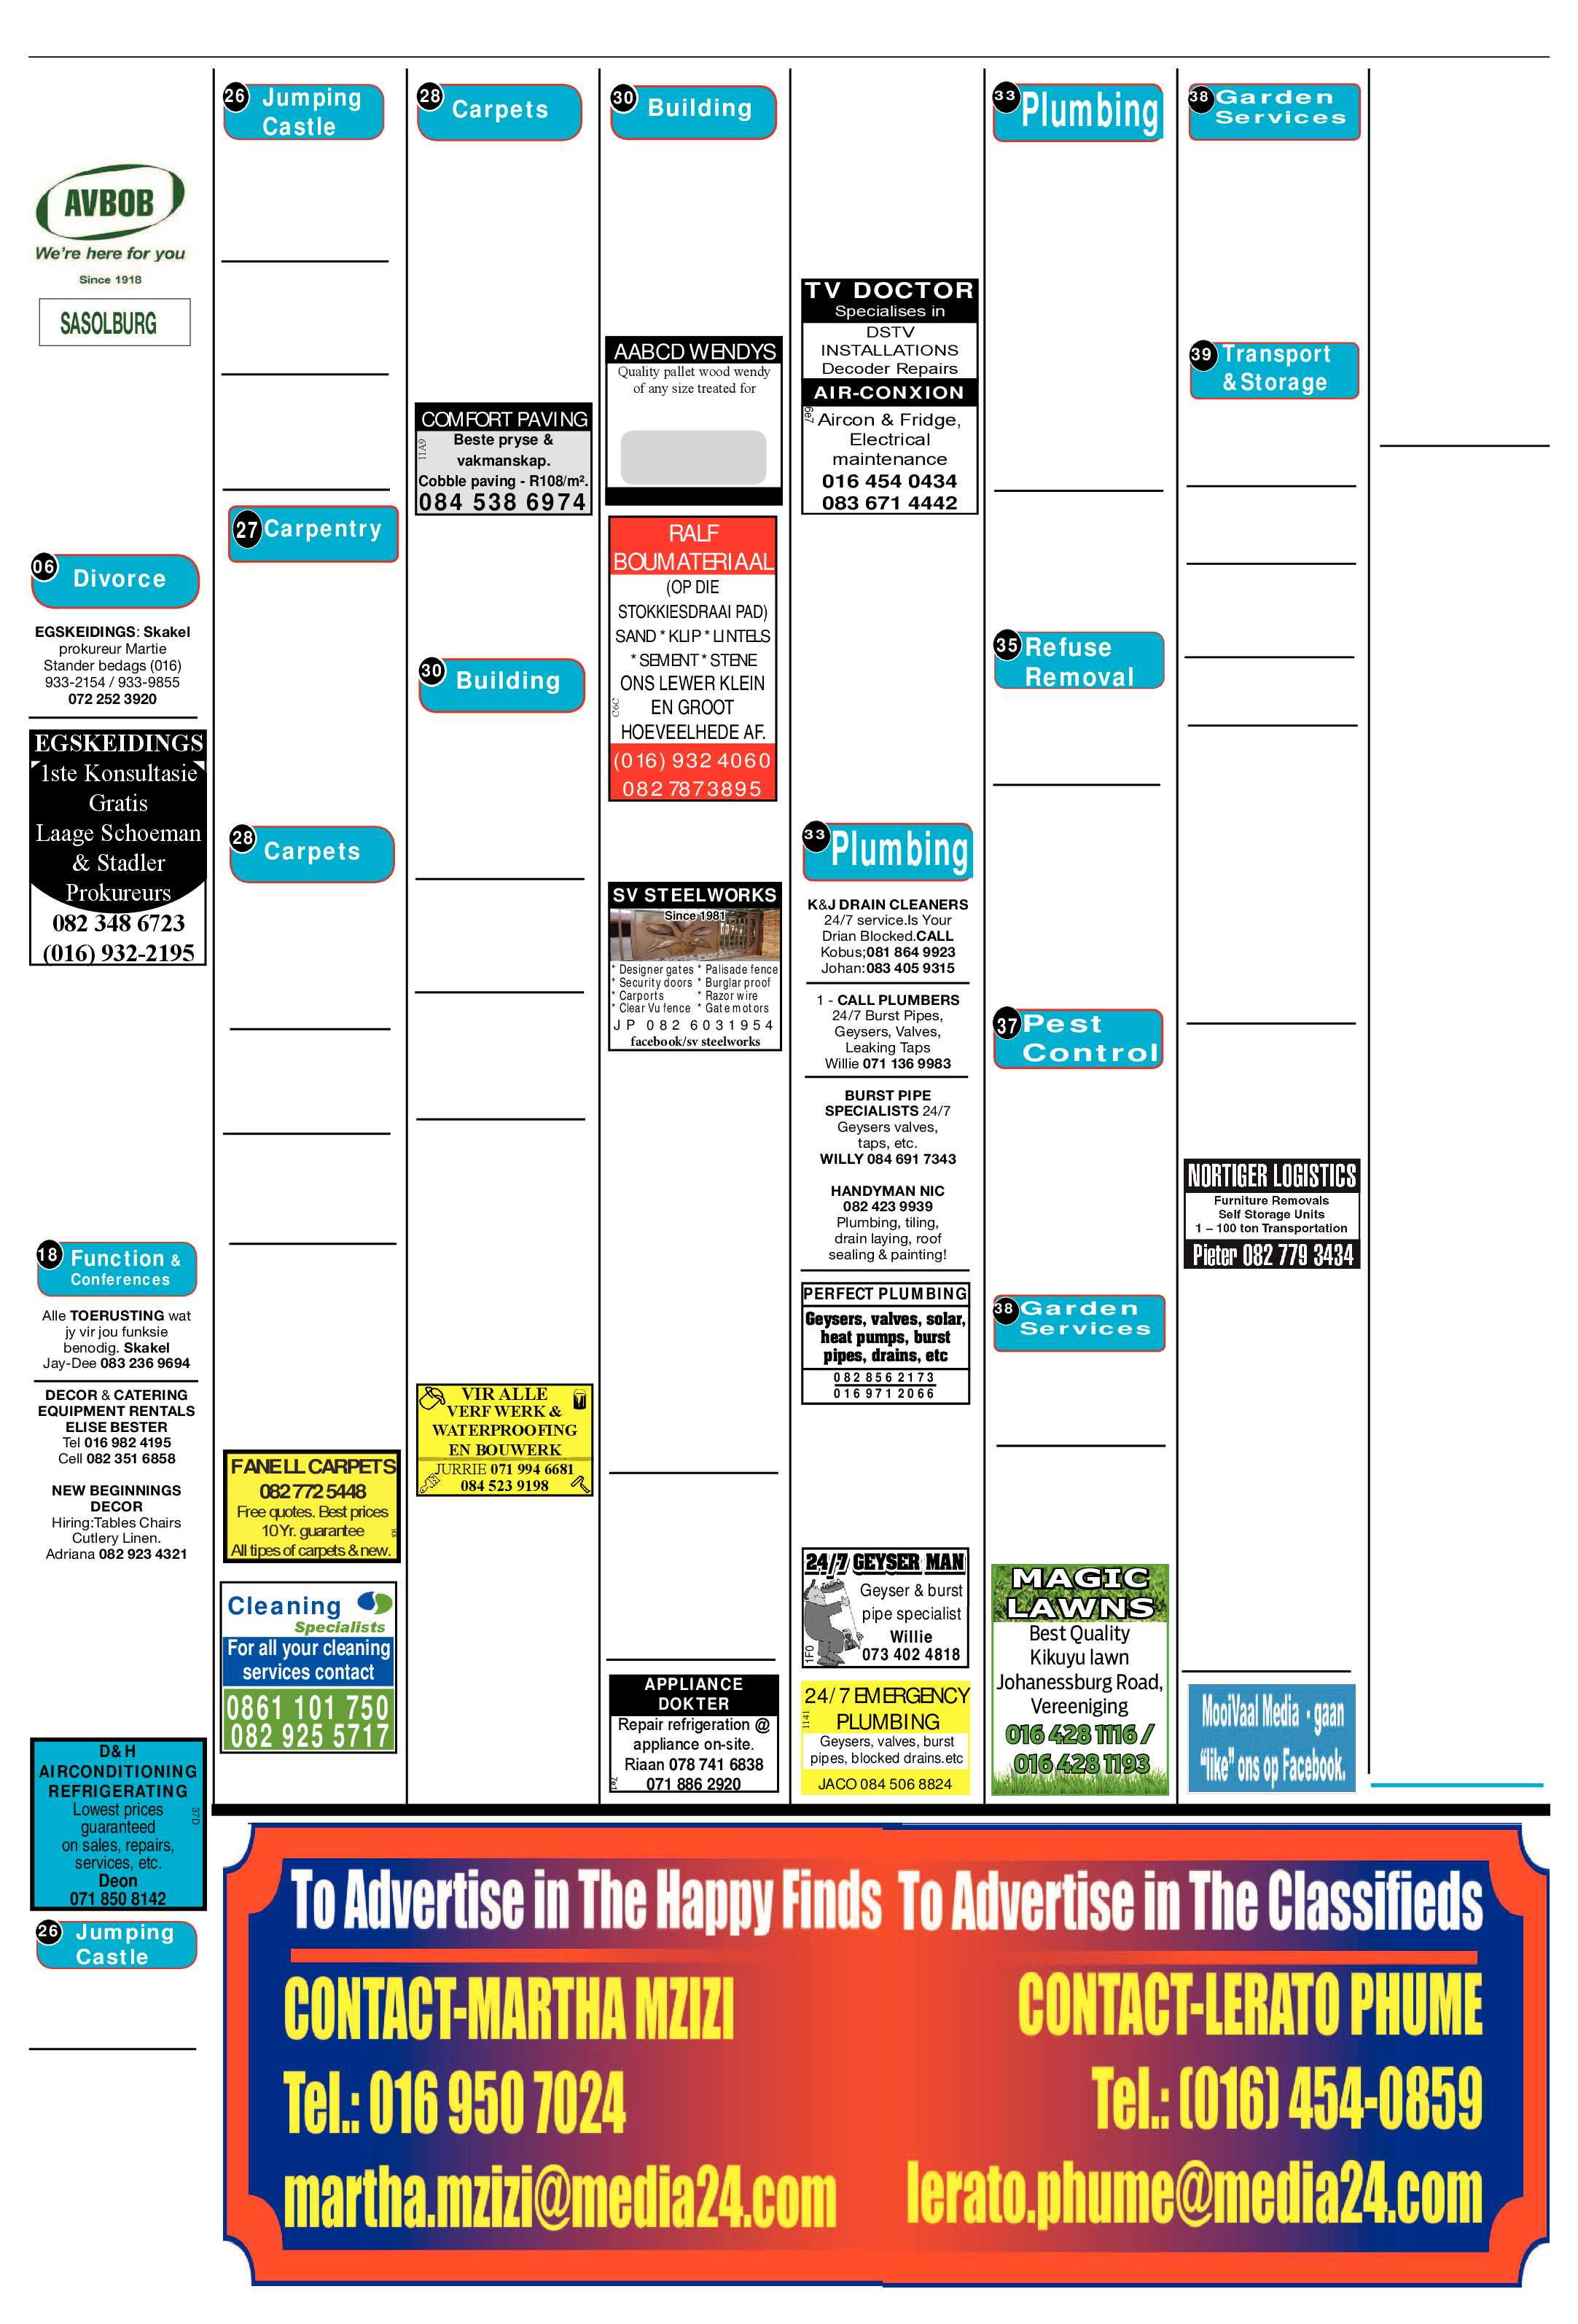 vereeniging-ster-16-22-mei-2017-epapers-page-11